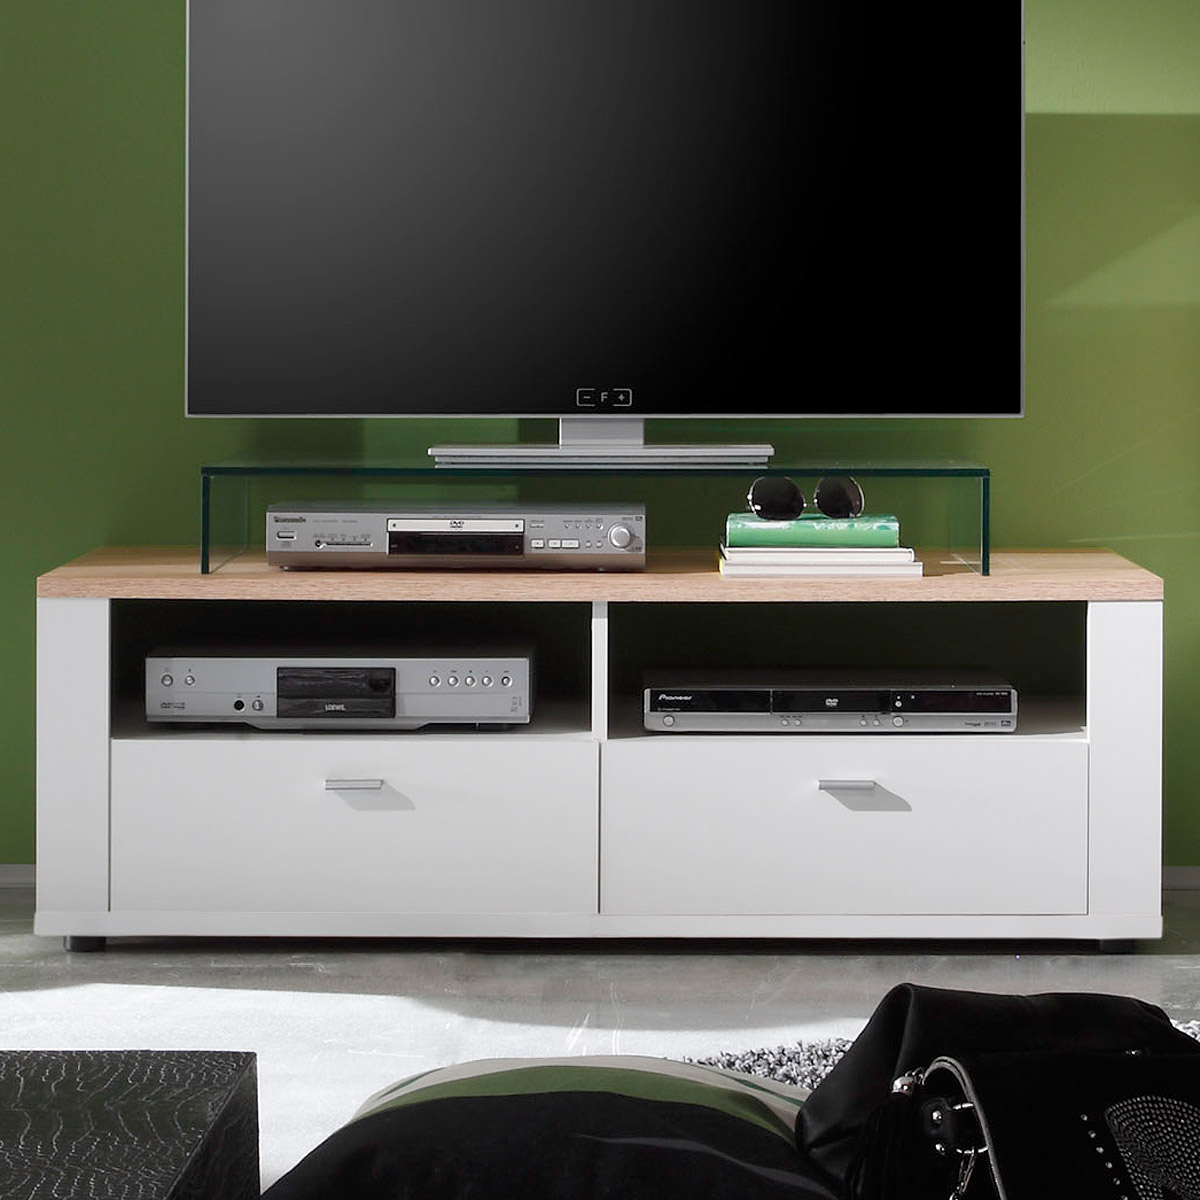 tv mbel eiche sgerau sideboard in eichesgerau hell woody with tv mbel eiche sgerau great bl. Black Bedroom Furniture Sets. Home Design Ideas